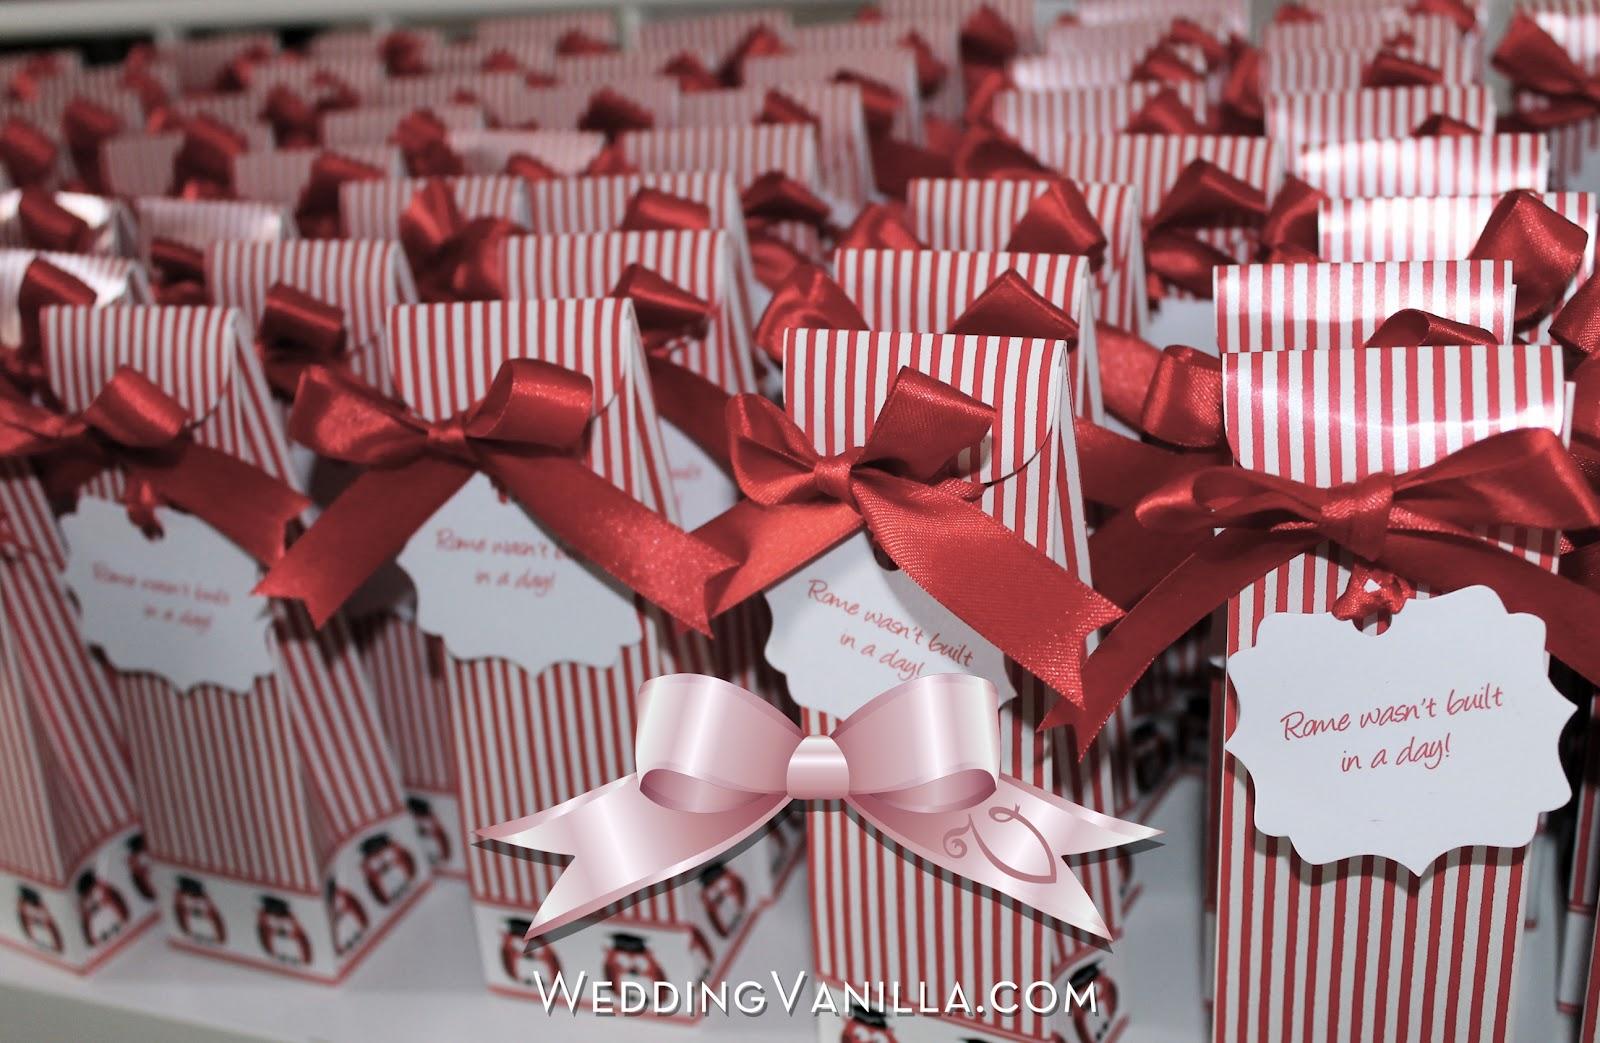 Festa di laurea idee originali na96 regardsdefemmes for Addobbi laurea